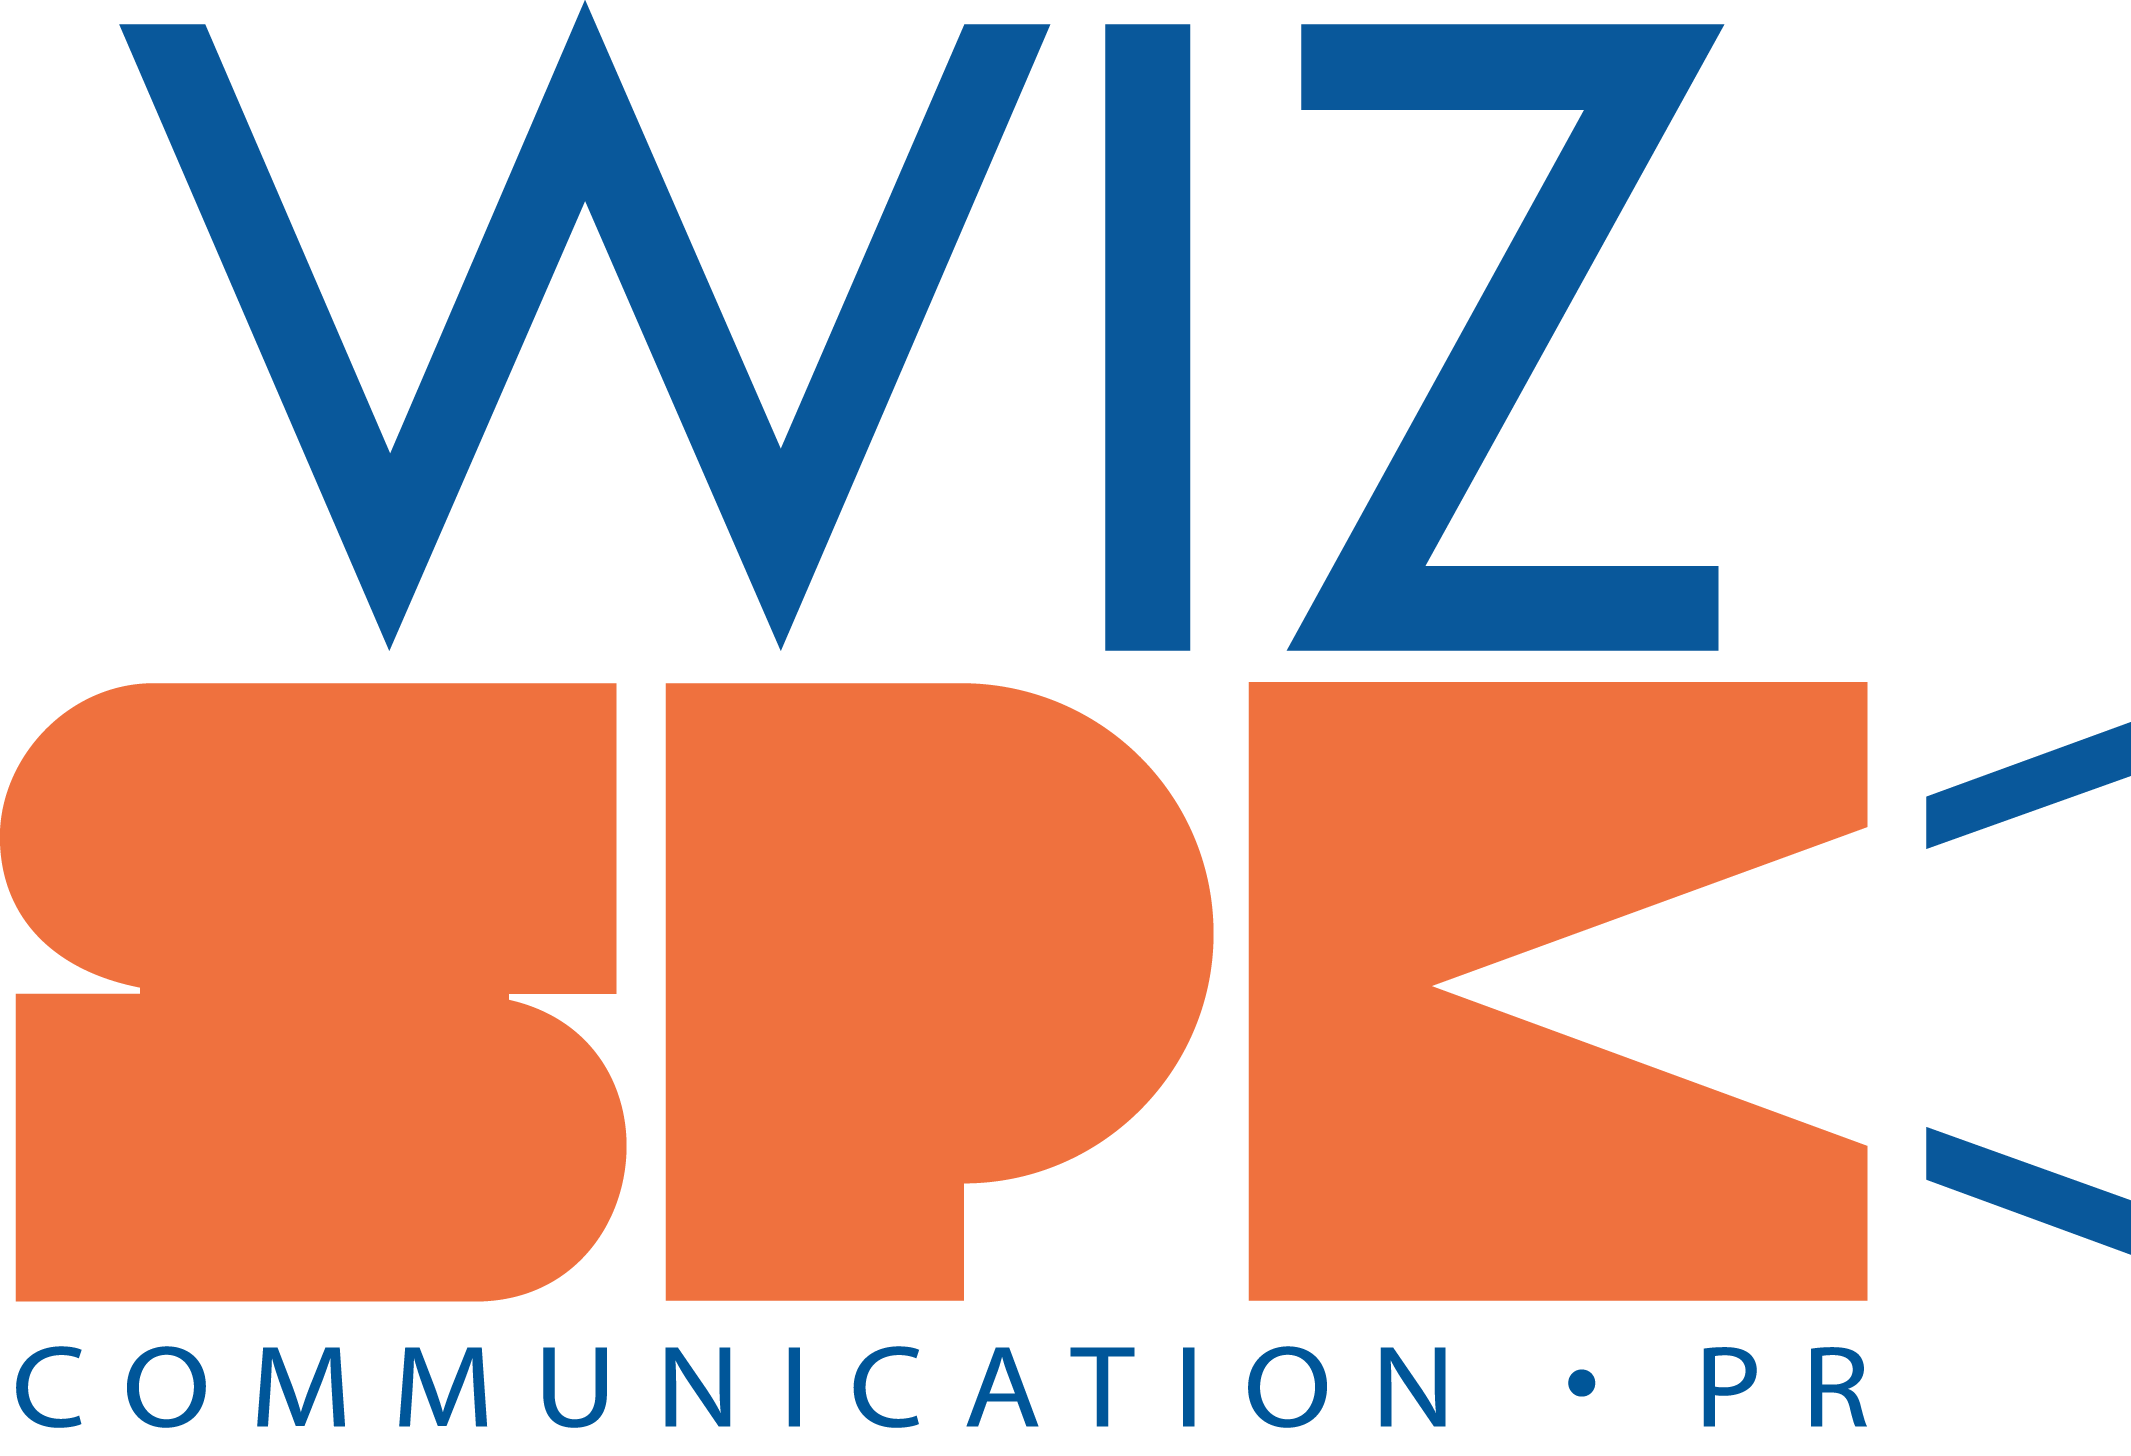 7ea9e2783e Wizspk Communication Competitors, Revenue and Employees - Owler Company  Profile